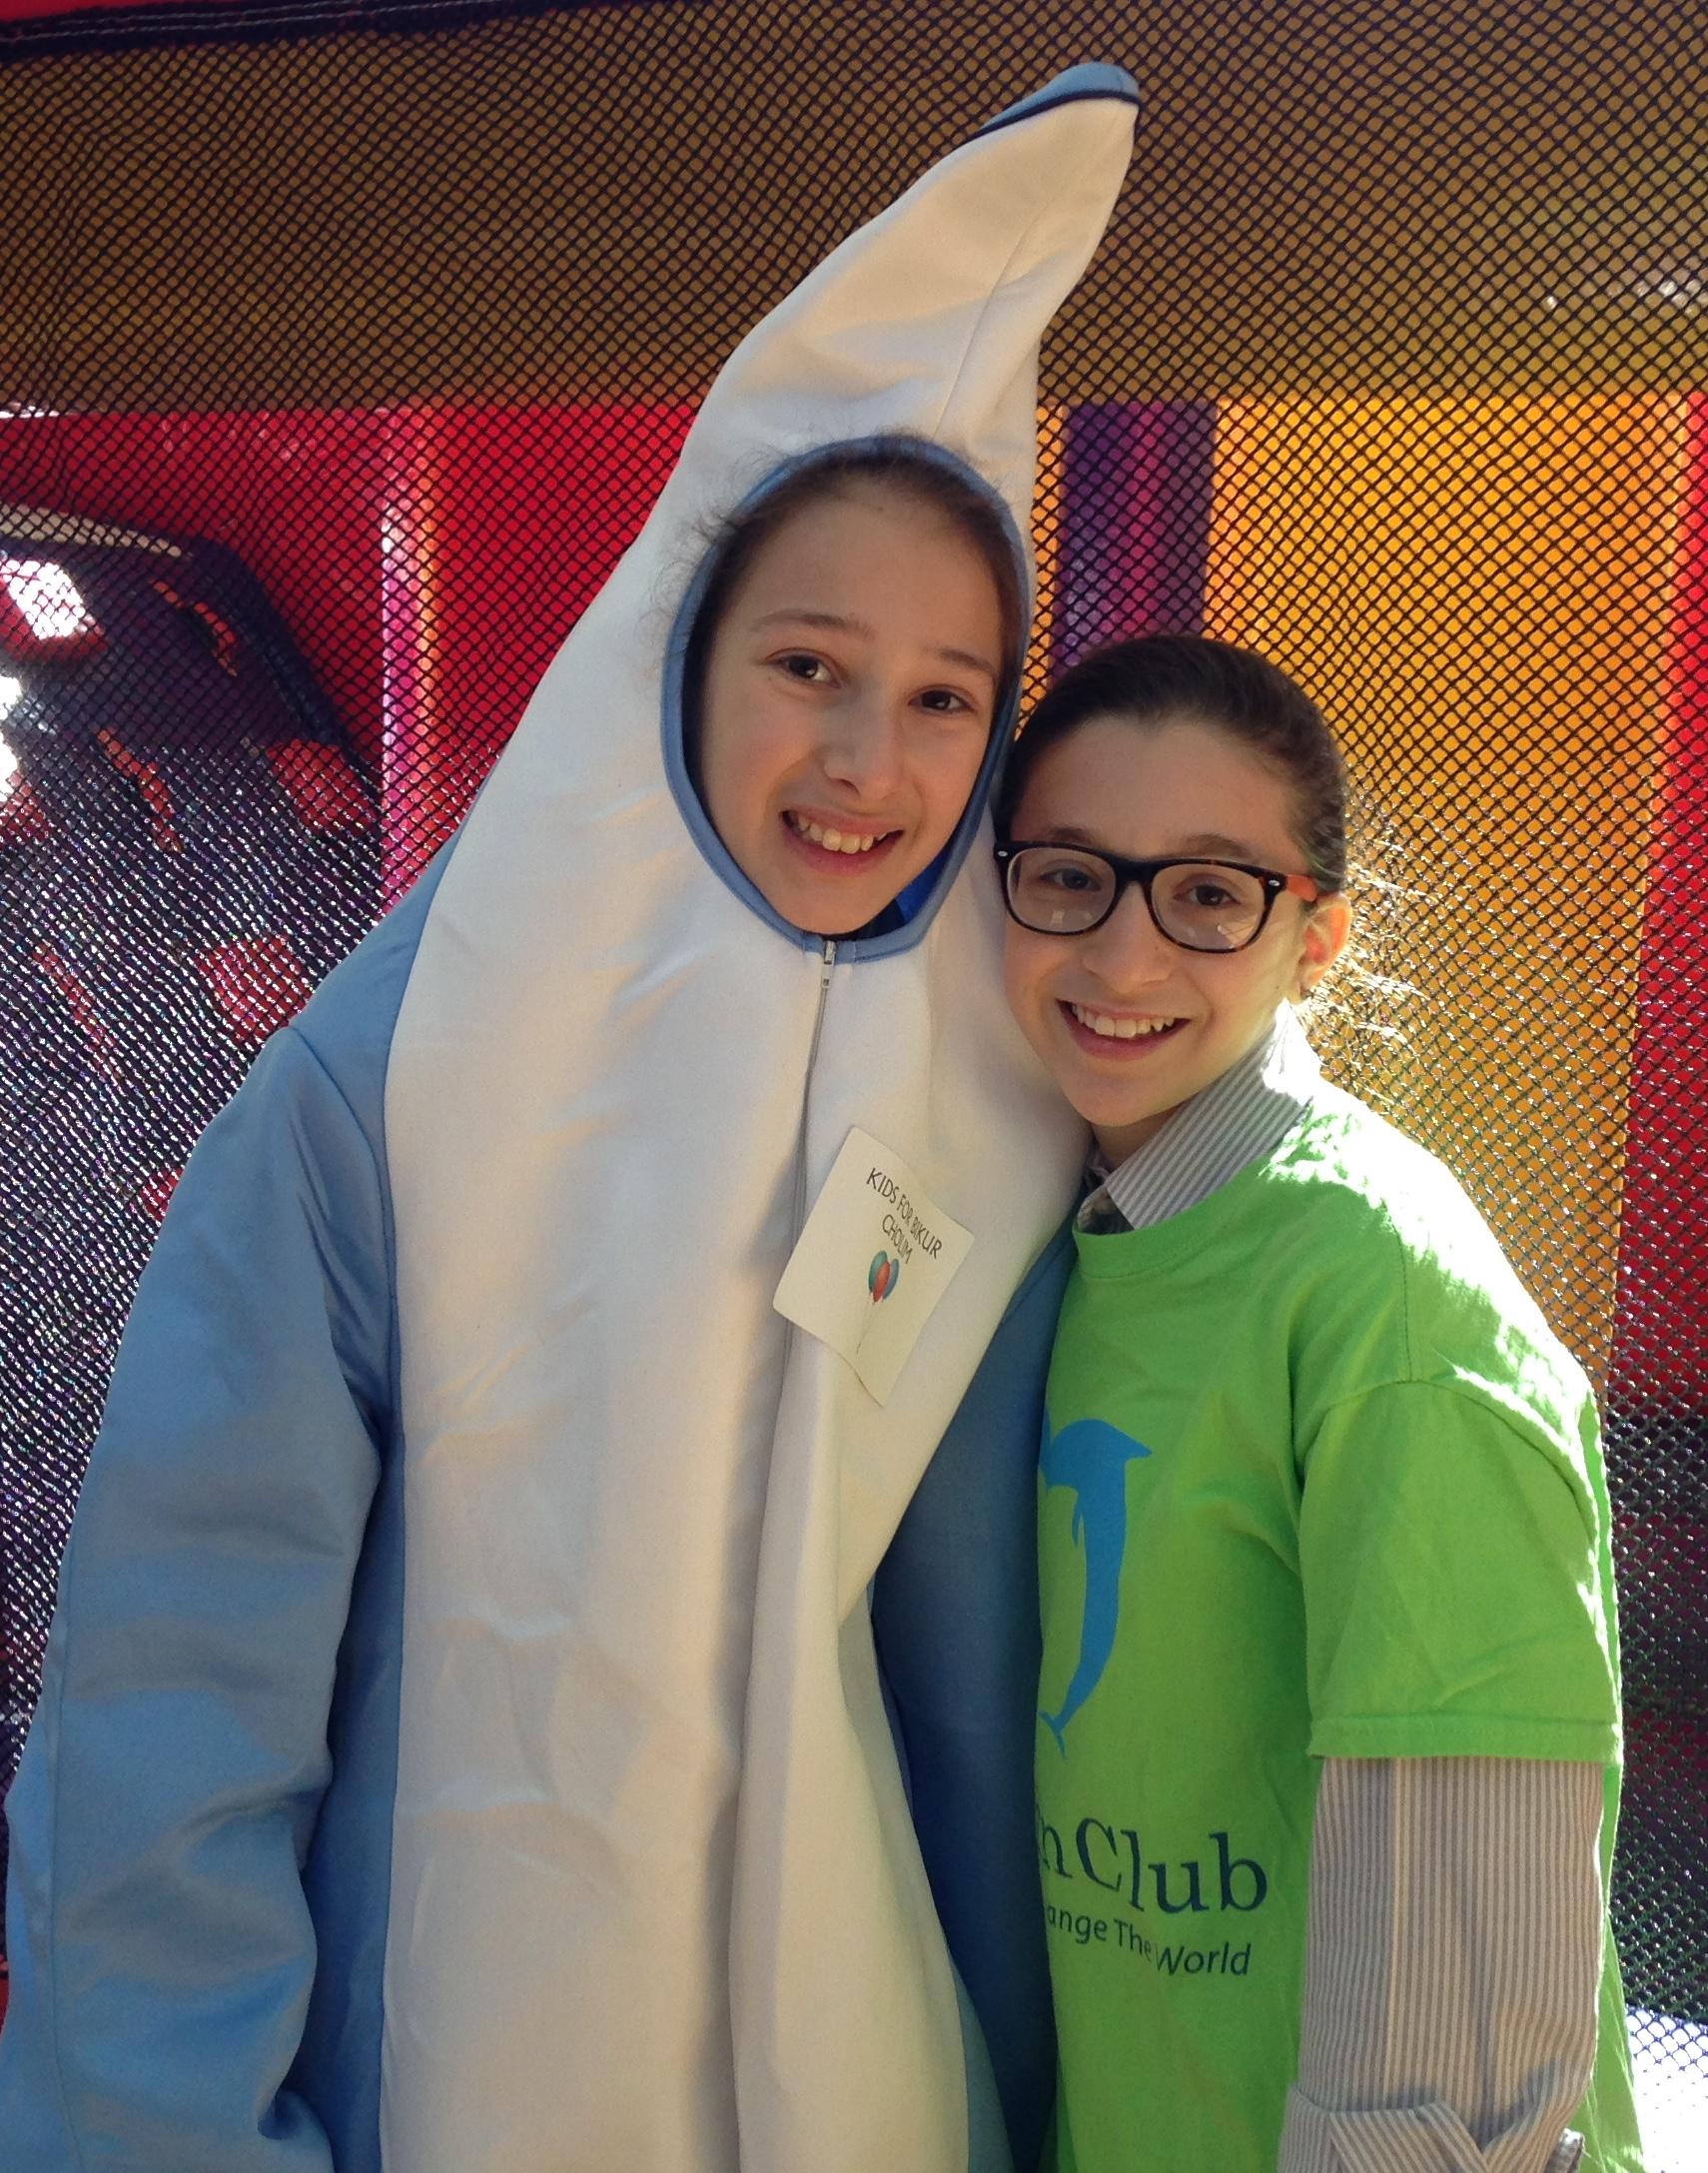 Dolphin Club mascot & friend